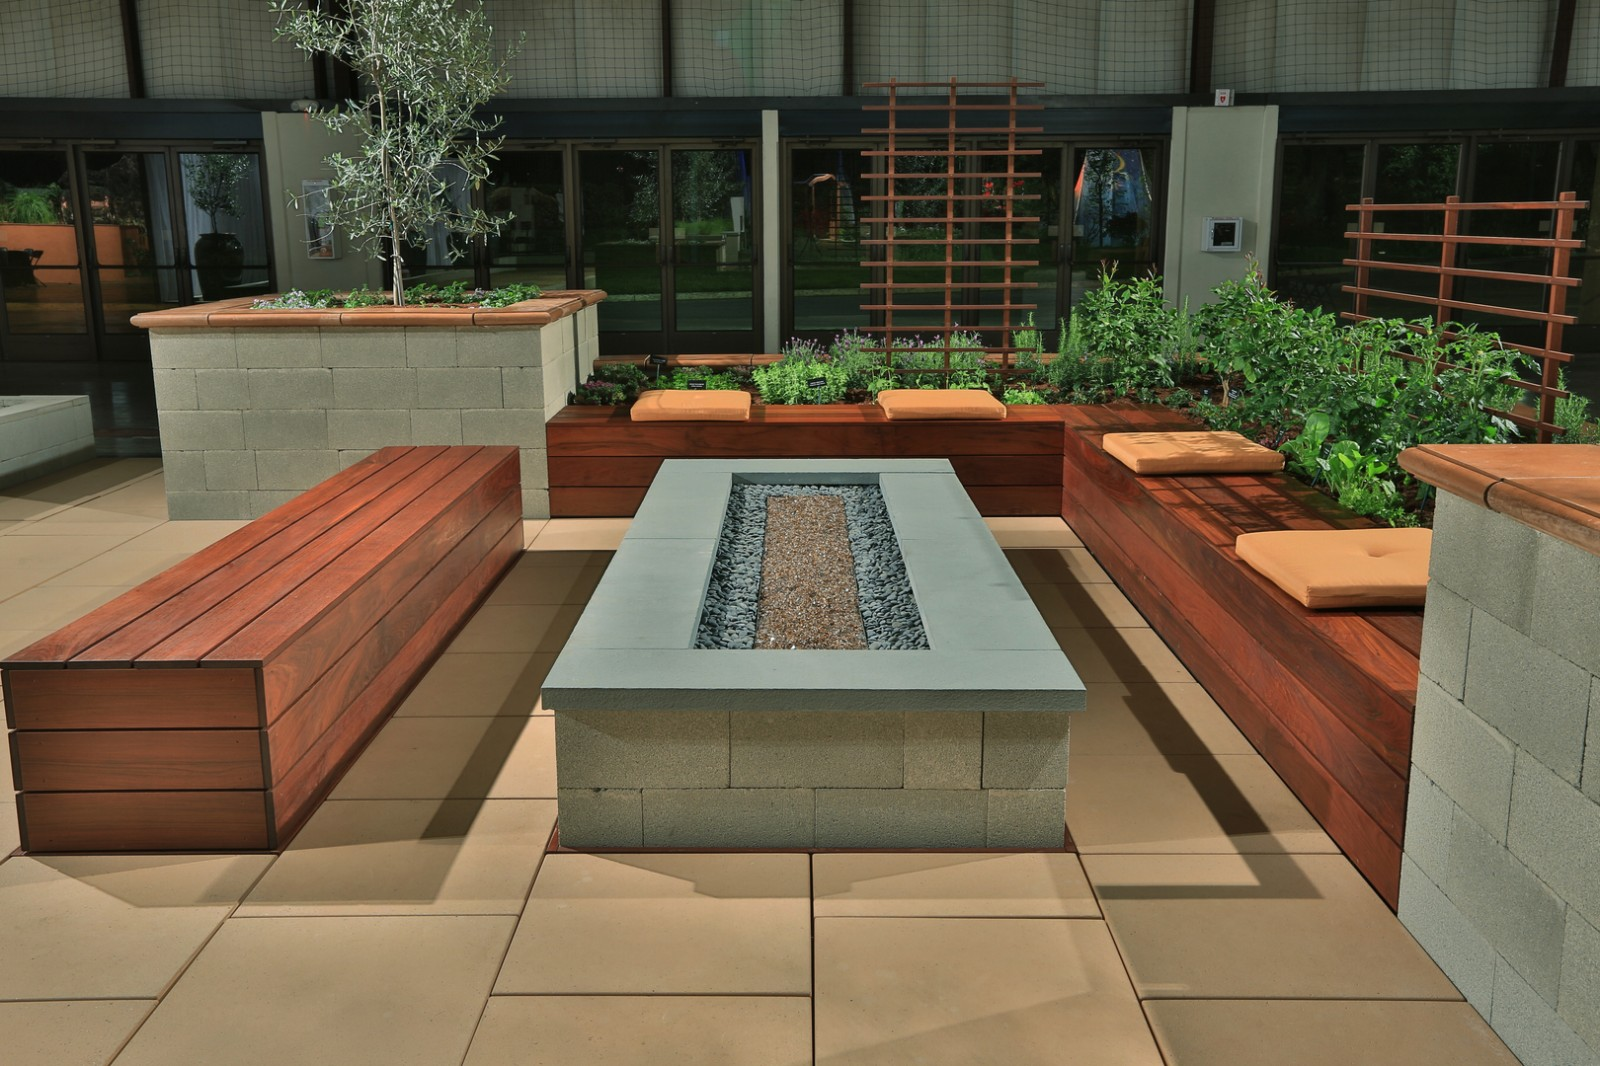 the_garden_at_villa_bella_corte_10_20161027_1451198009